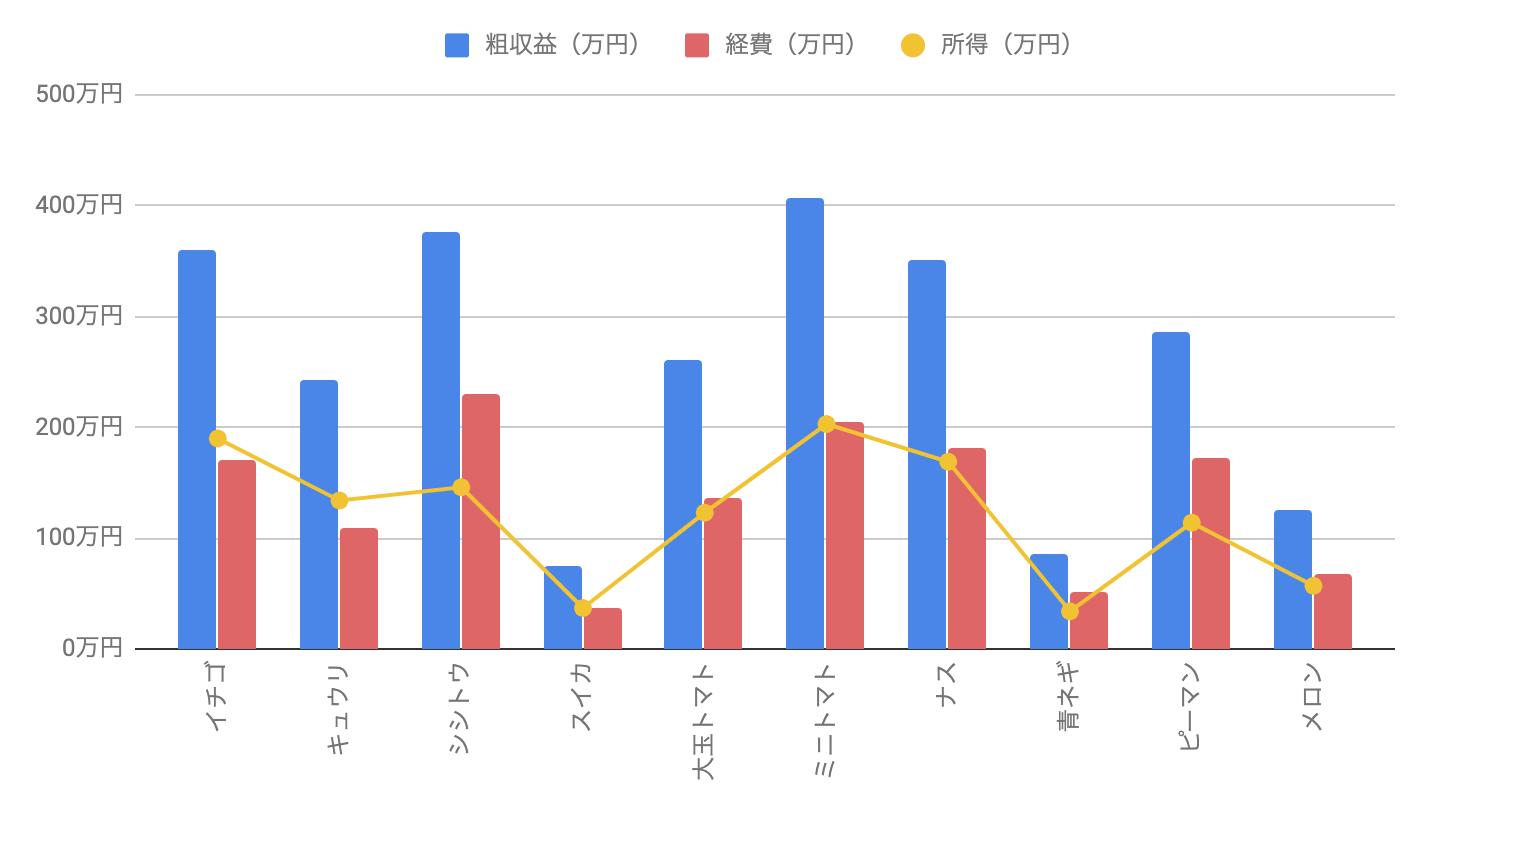 H19年 品目別経営統計(施設野菜)